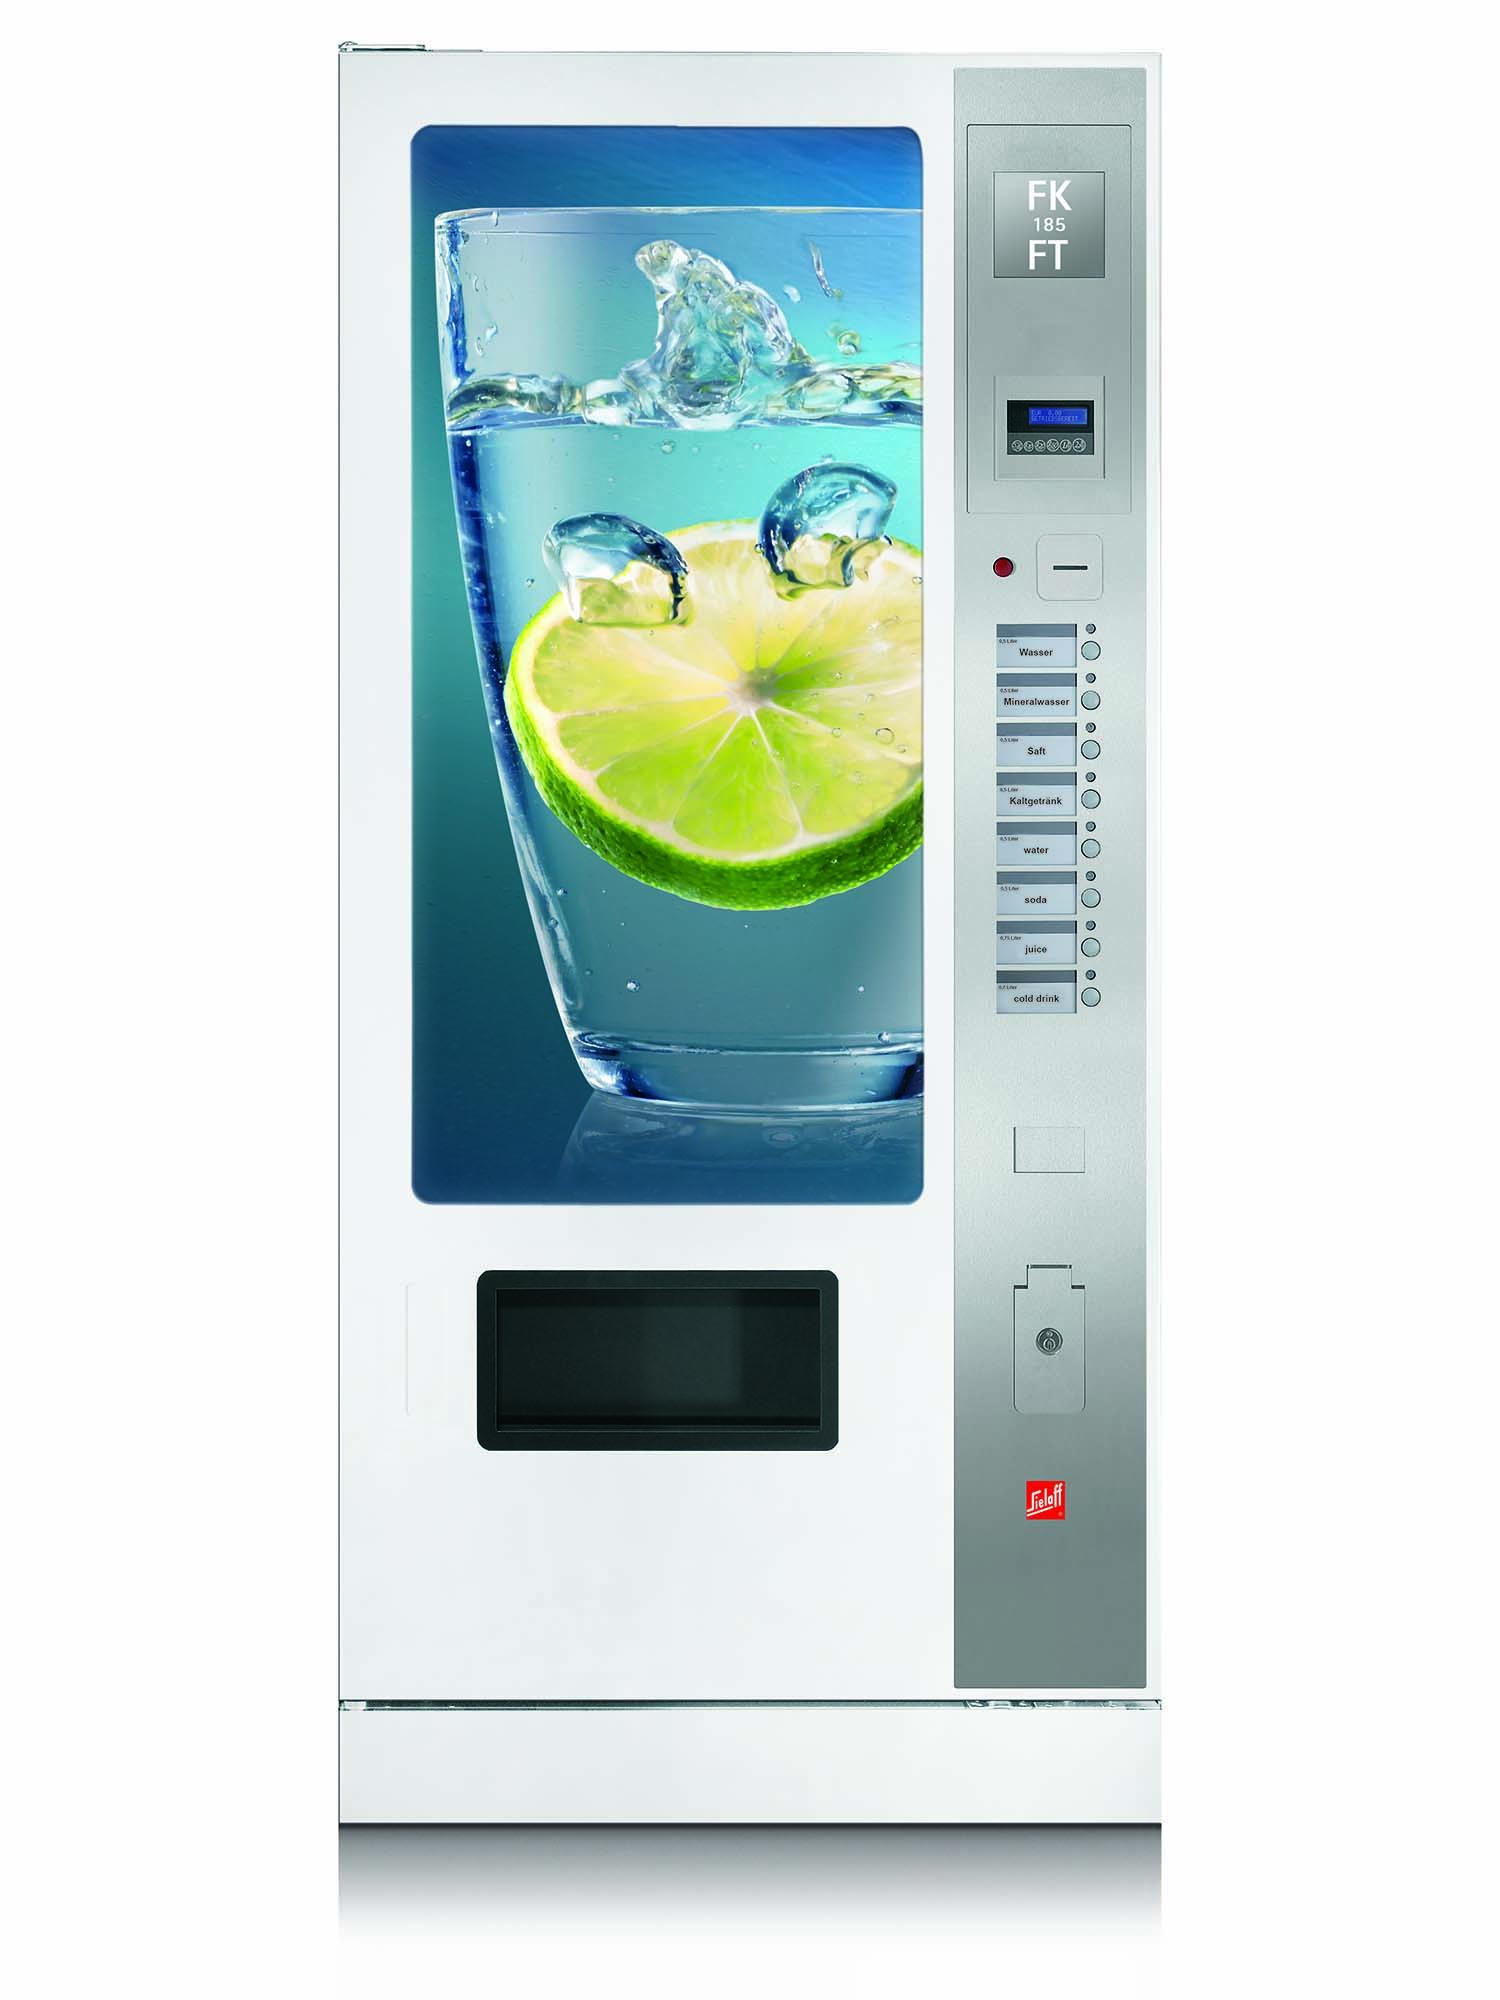 Getränke Meyer - Automaten